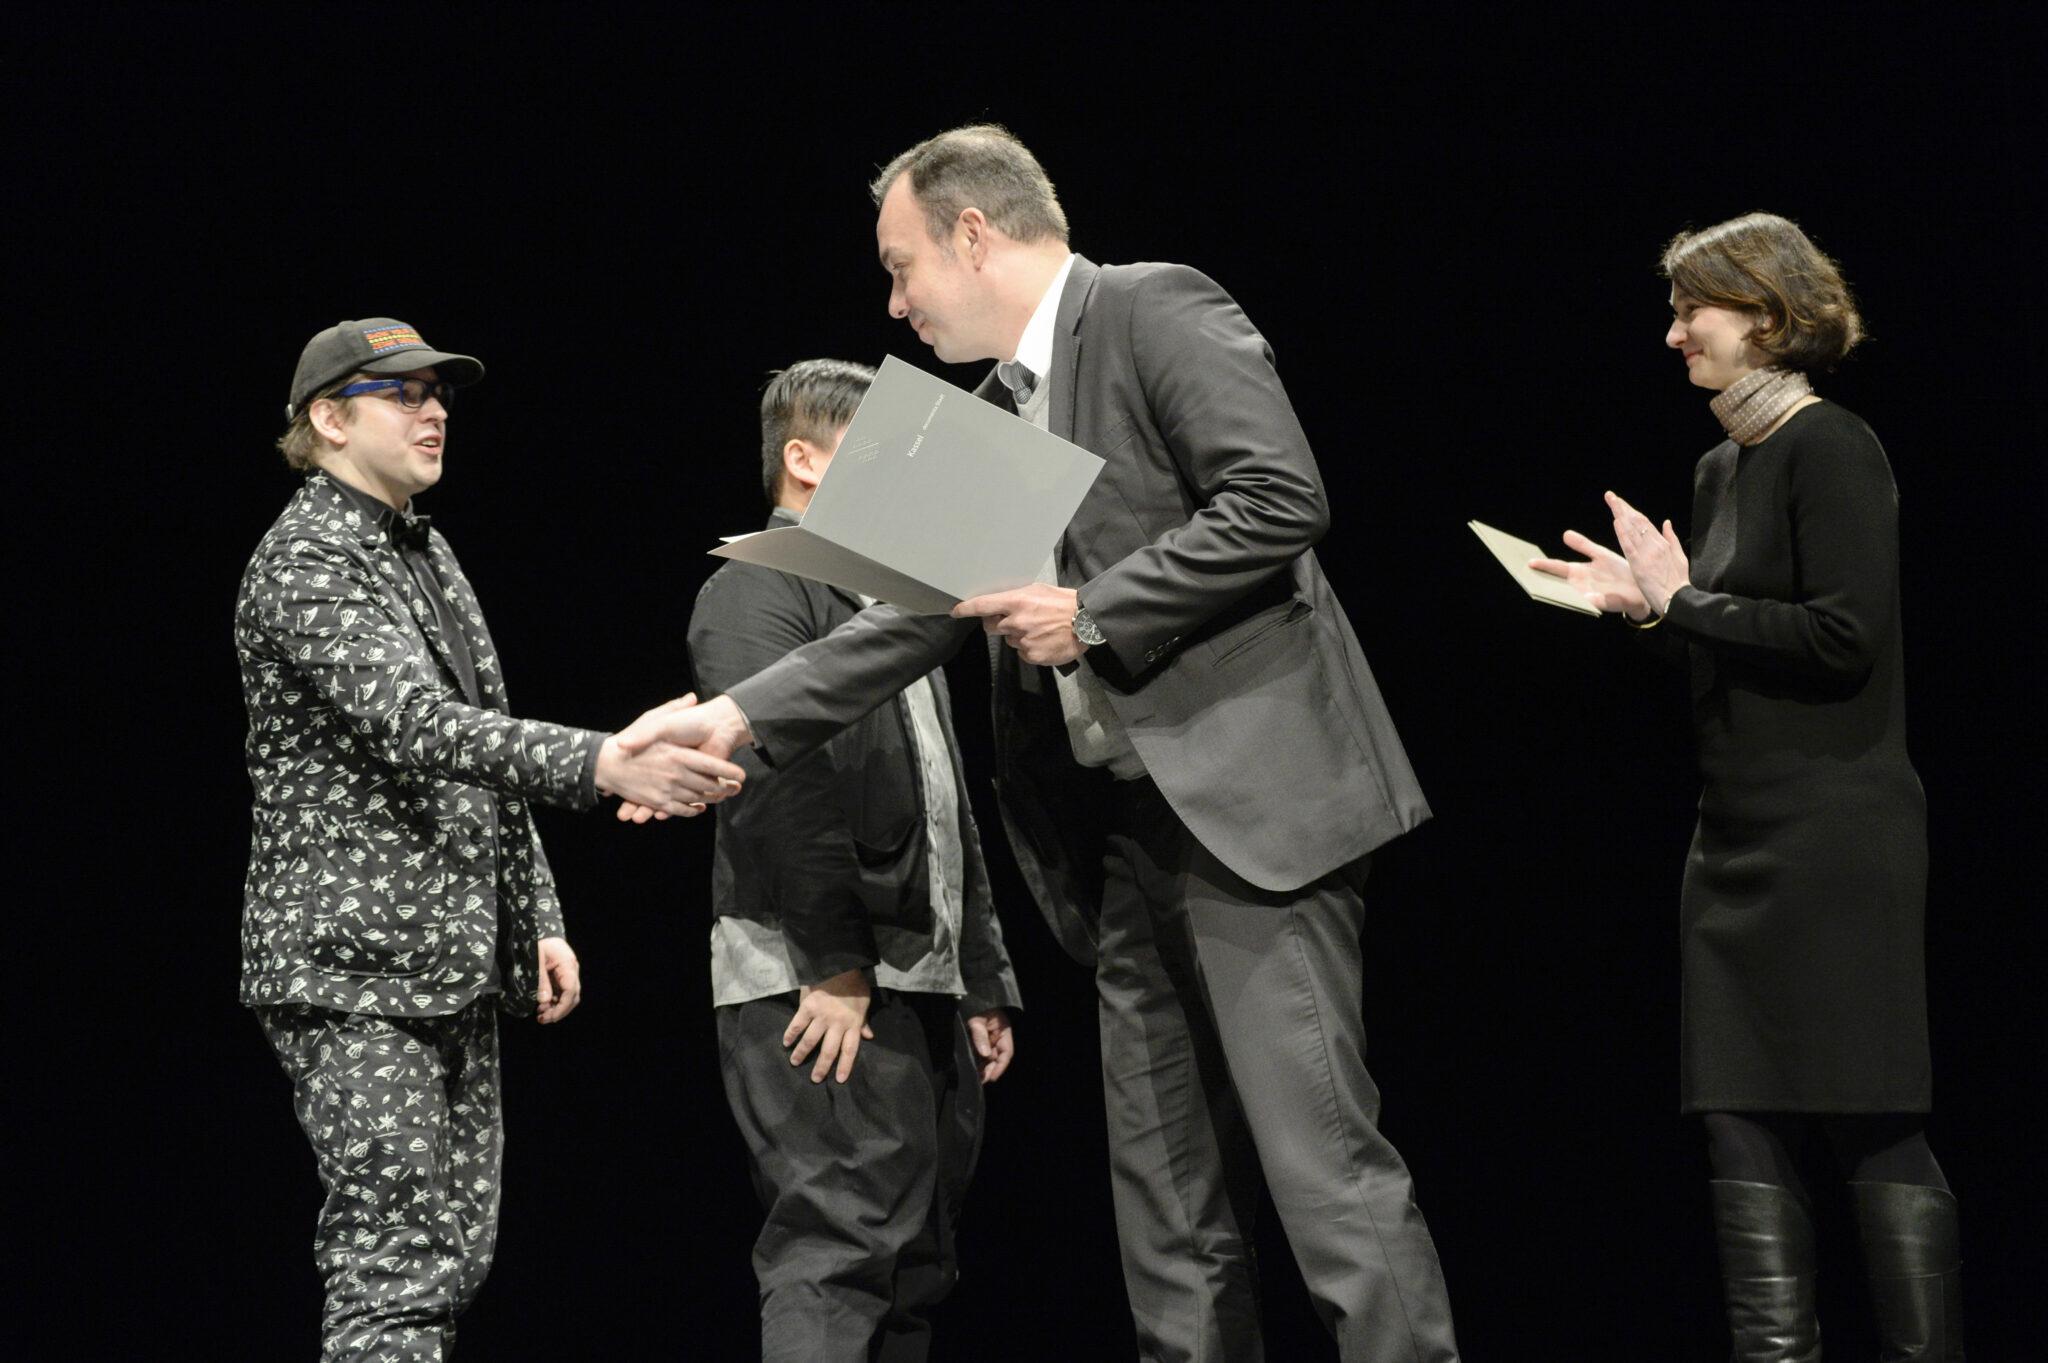 Kulturförderpreis der Stadt Kassel 2017 Staatstheater Kassel 03.12.2017 Foto © N. Klinger